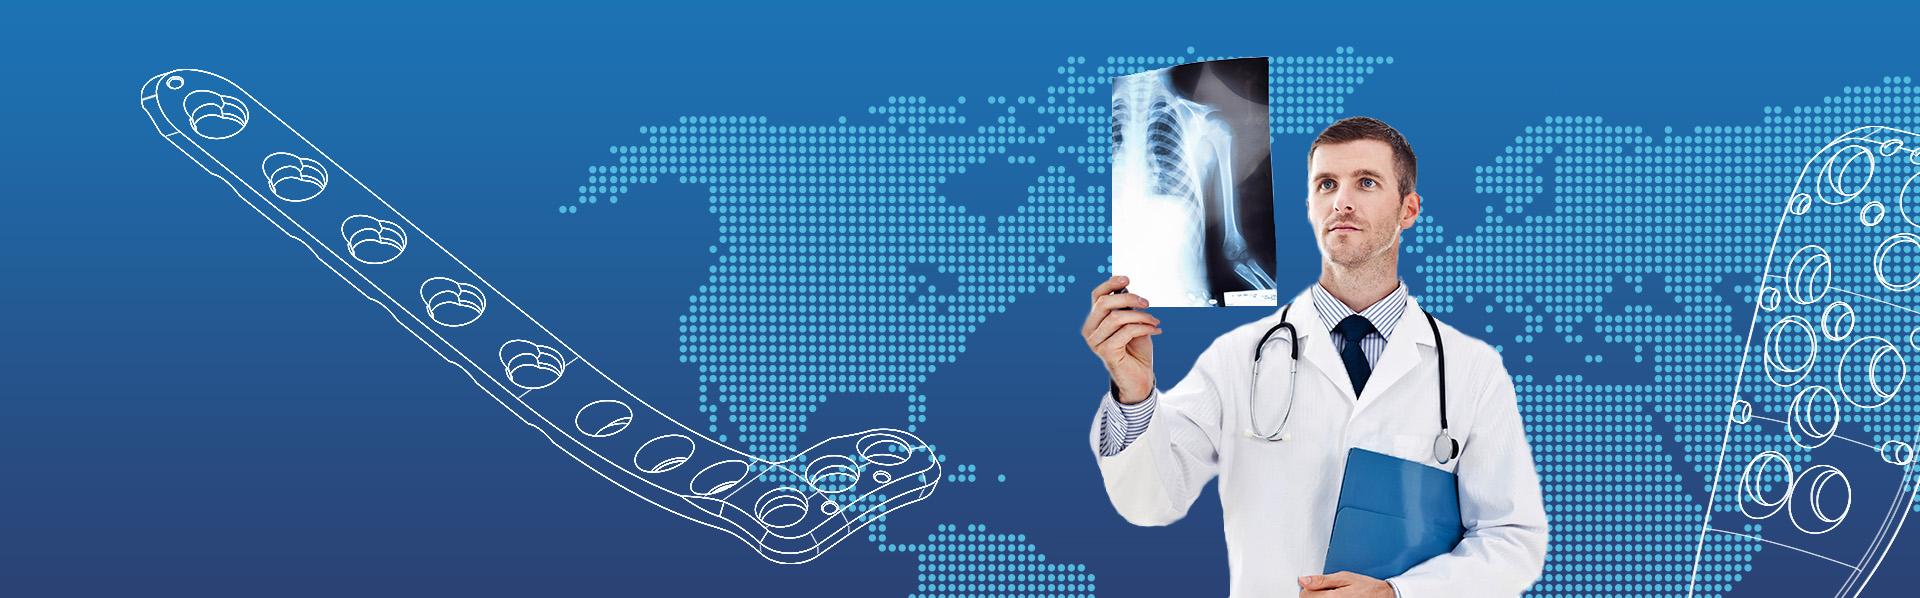 implanty dla ortopedii i traumatologii